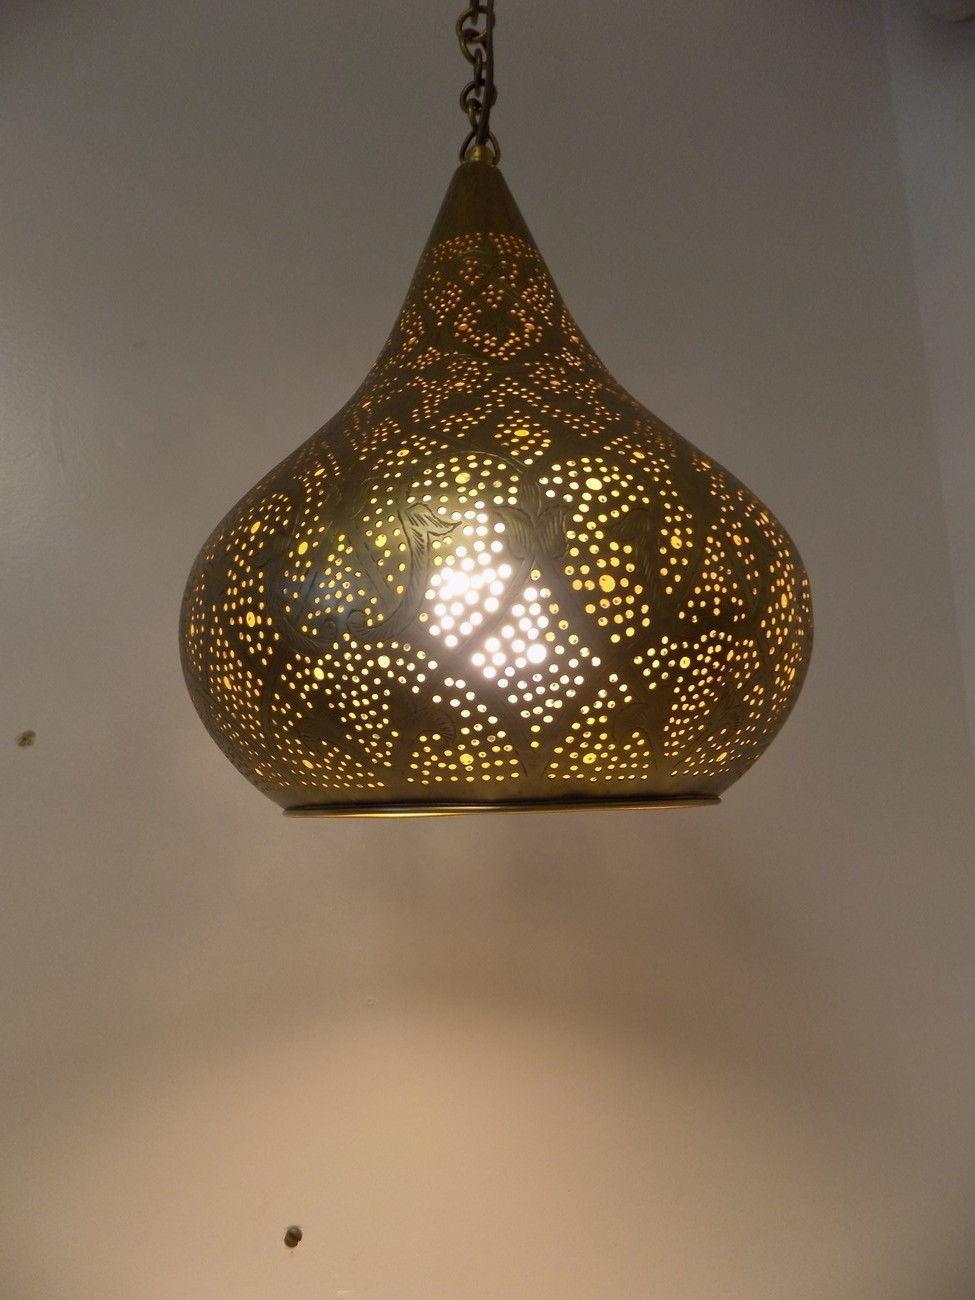 Moroccan Hanging Pendant Lamp And 50 Similar Items. 57